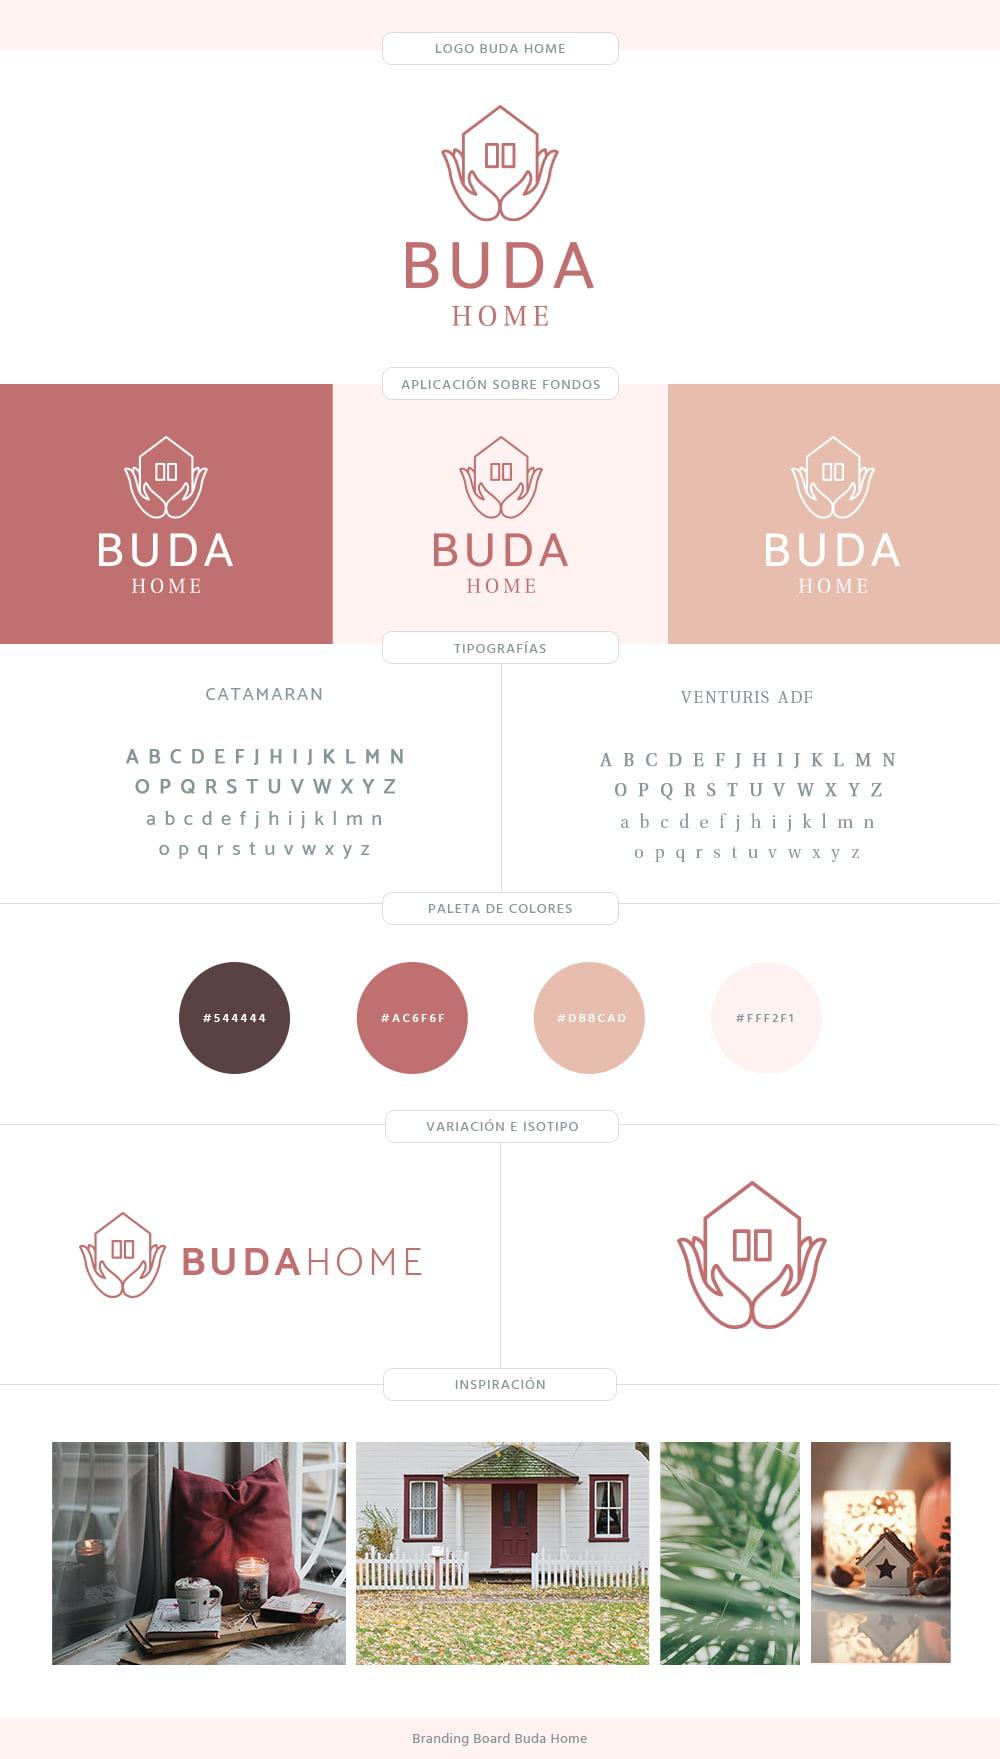 logo completo budahome - Buda Home